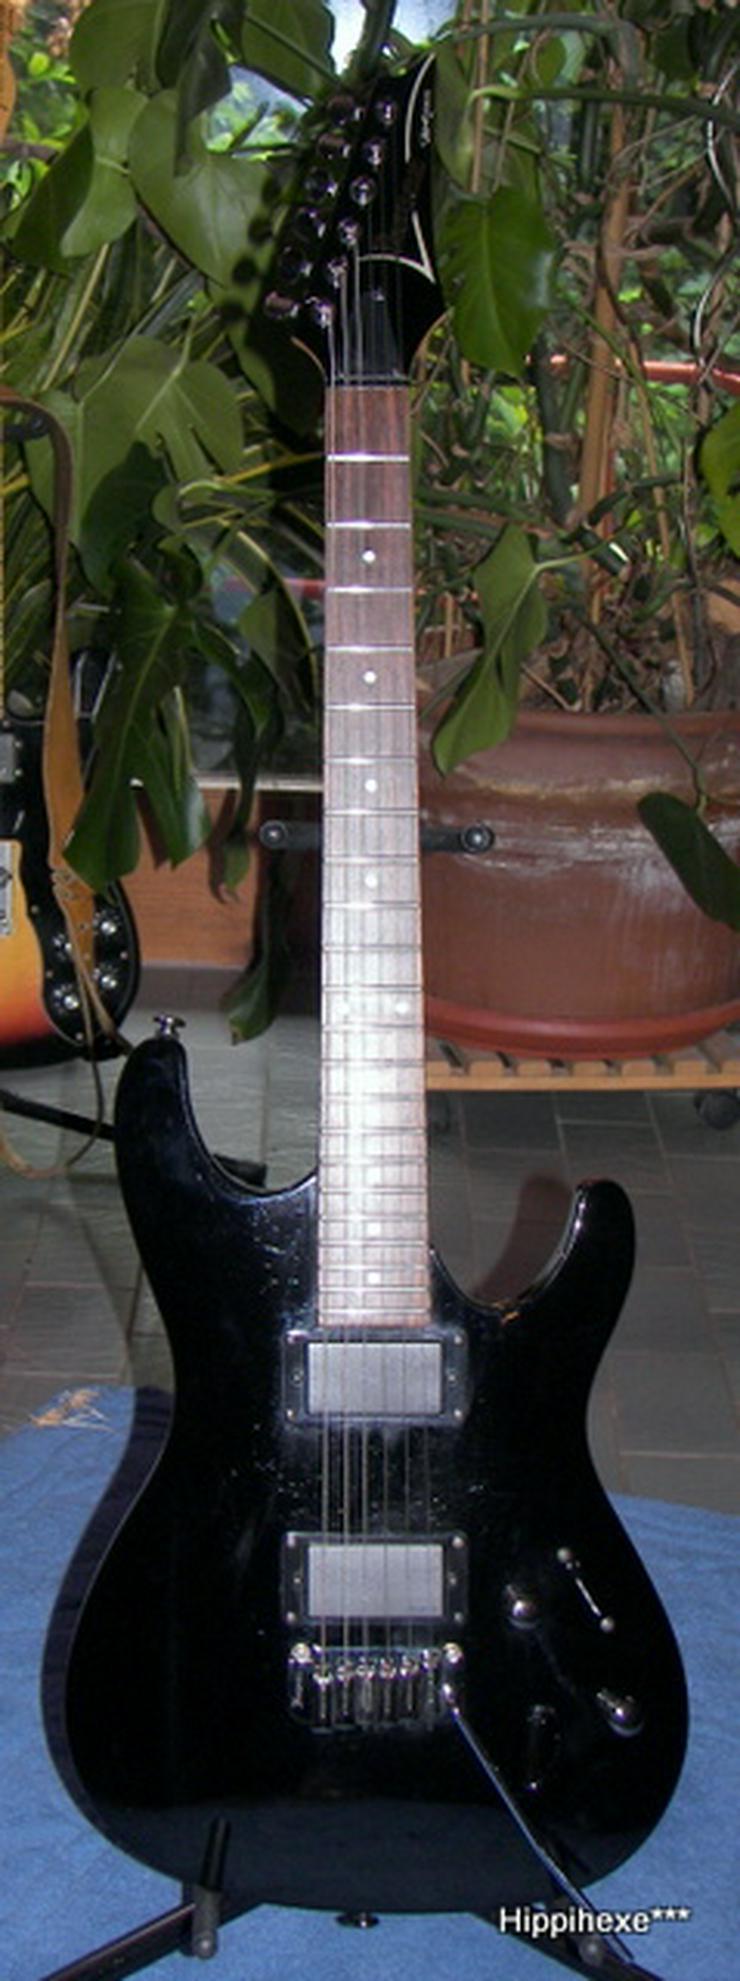 Bild 2: Ibanez SA 120 EX-BK schwarze Powerstrat E-Gitarre